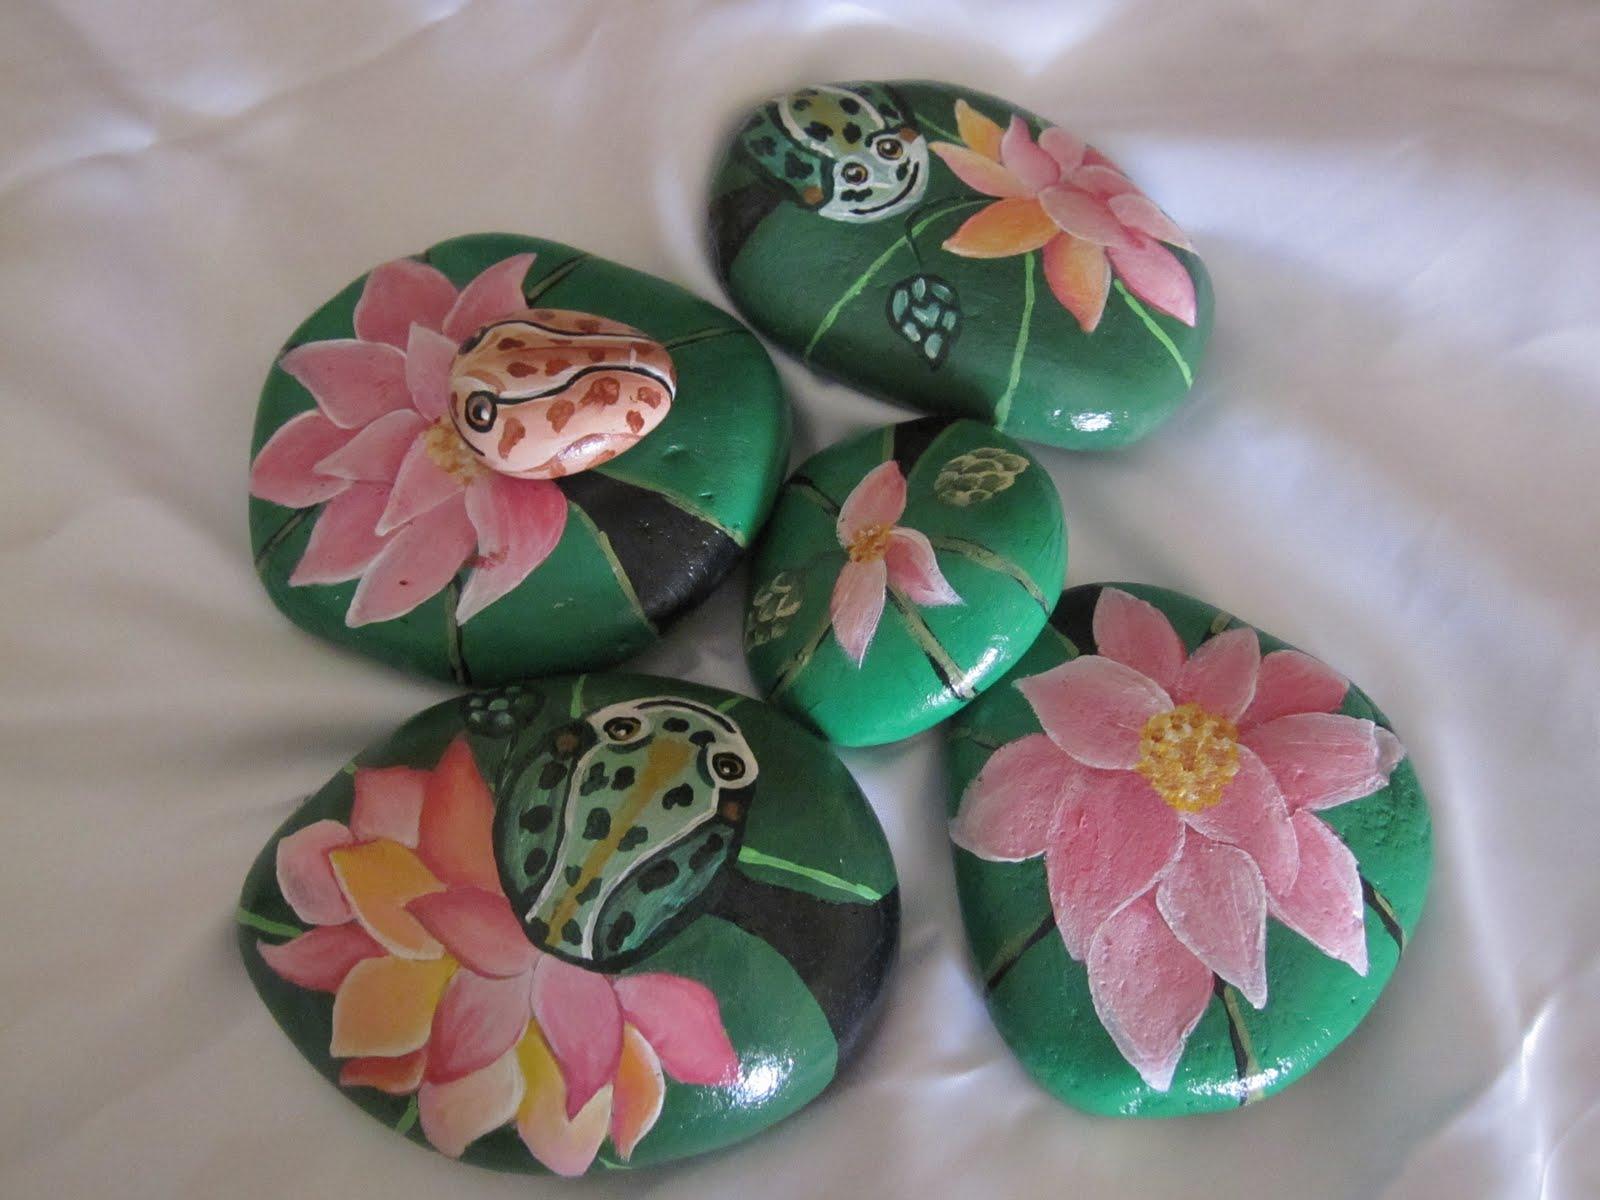 Lasmanualidadesdesule ultimas piedras pintadas del verano for Piedras pintadas a mano paso a paso